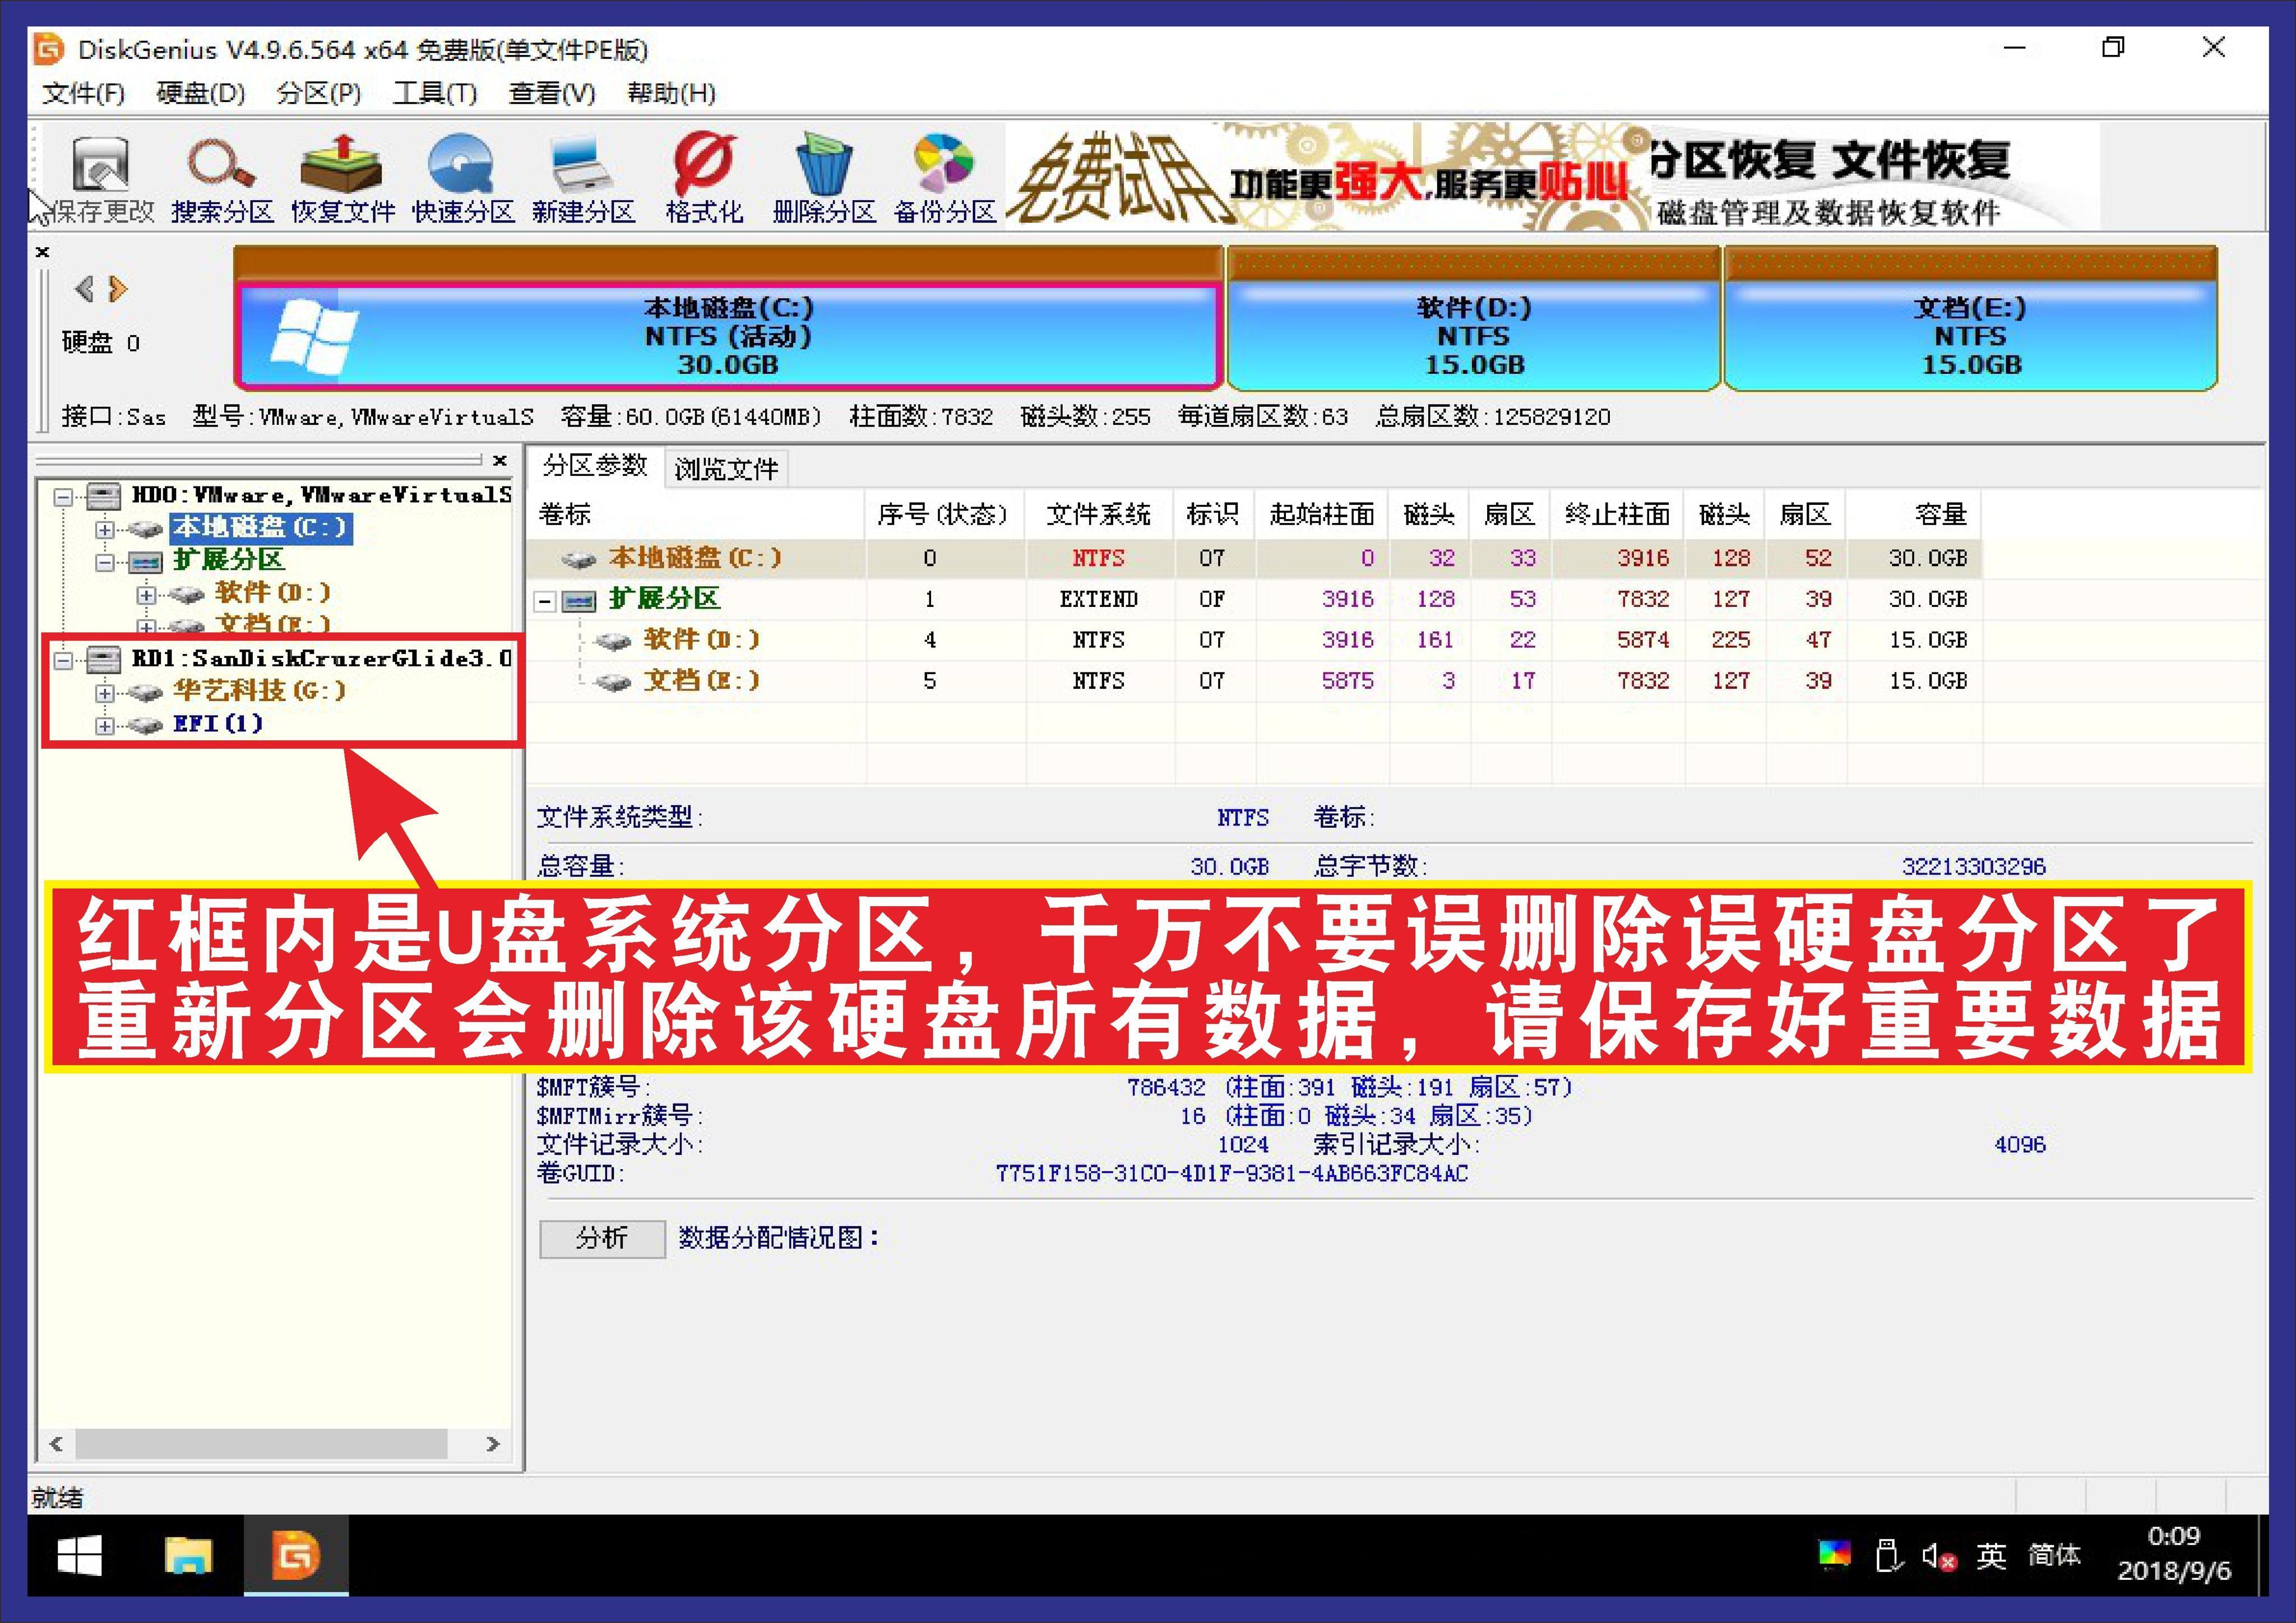 Windows7系统原版安装教程神曲奏界第一部图片